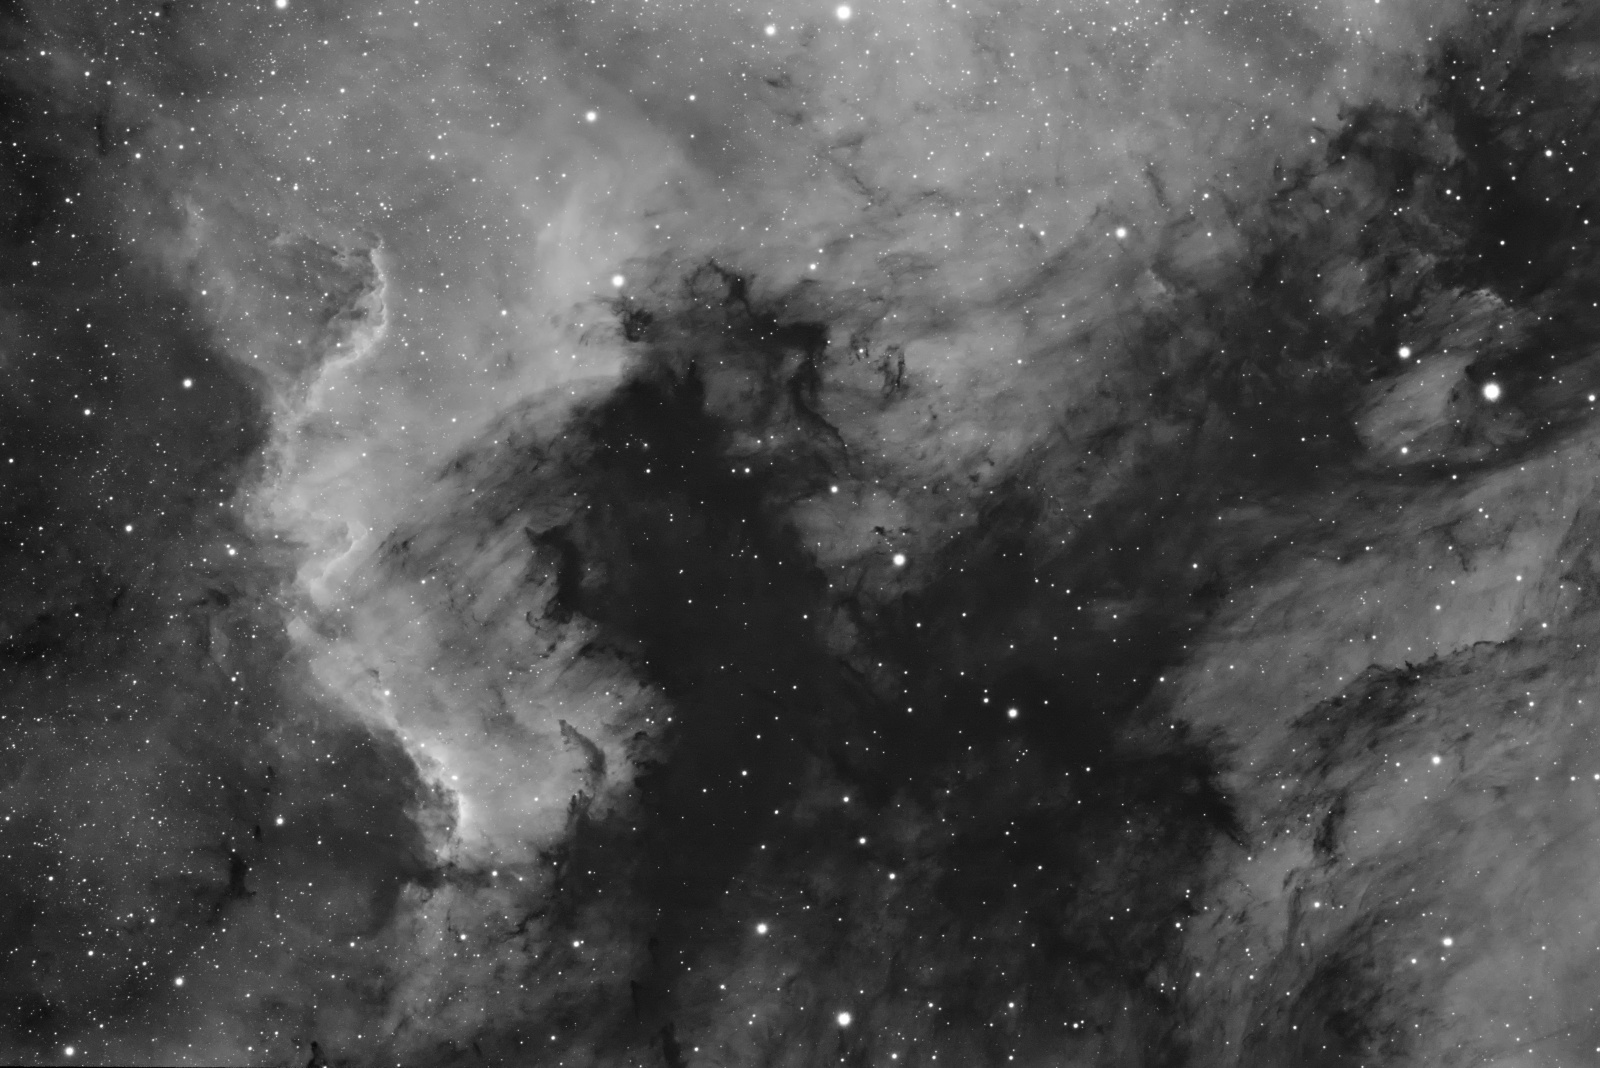 NGC7000-Hydrogen-alpha-session_1-lpc-reg-St-2.jpg